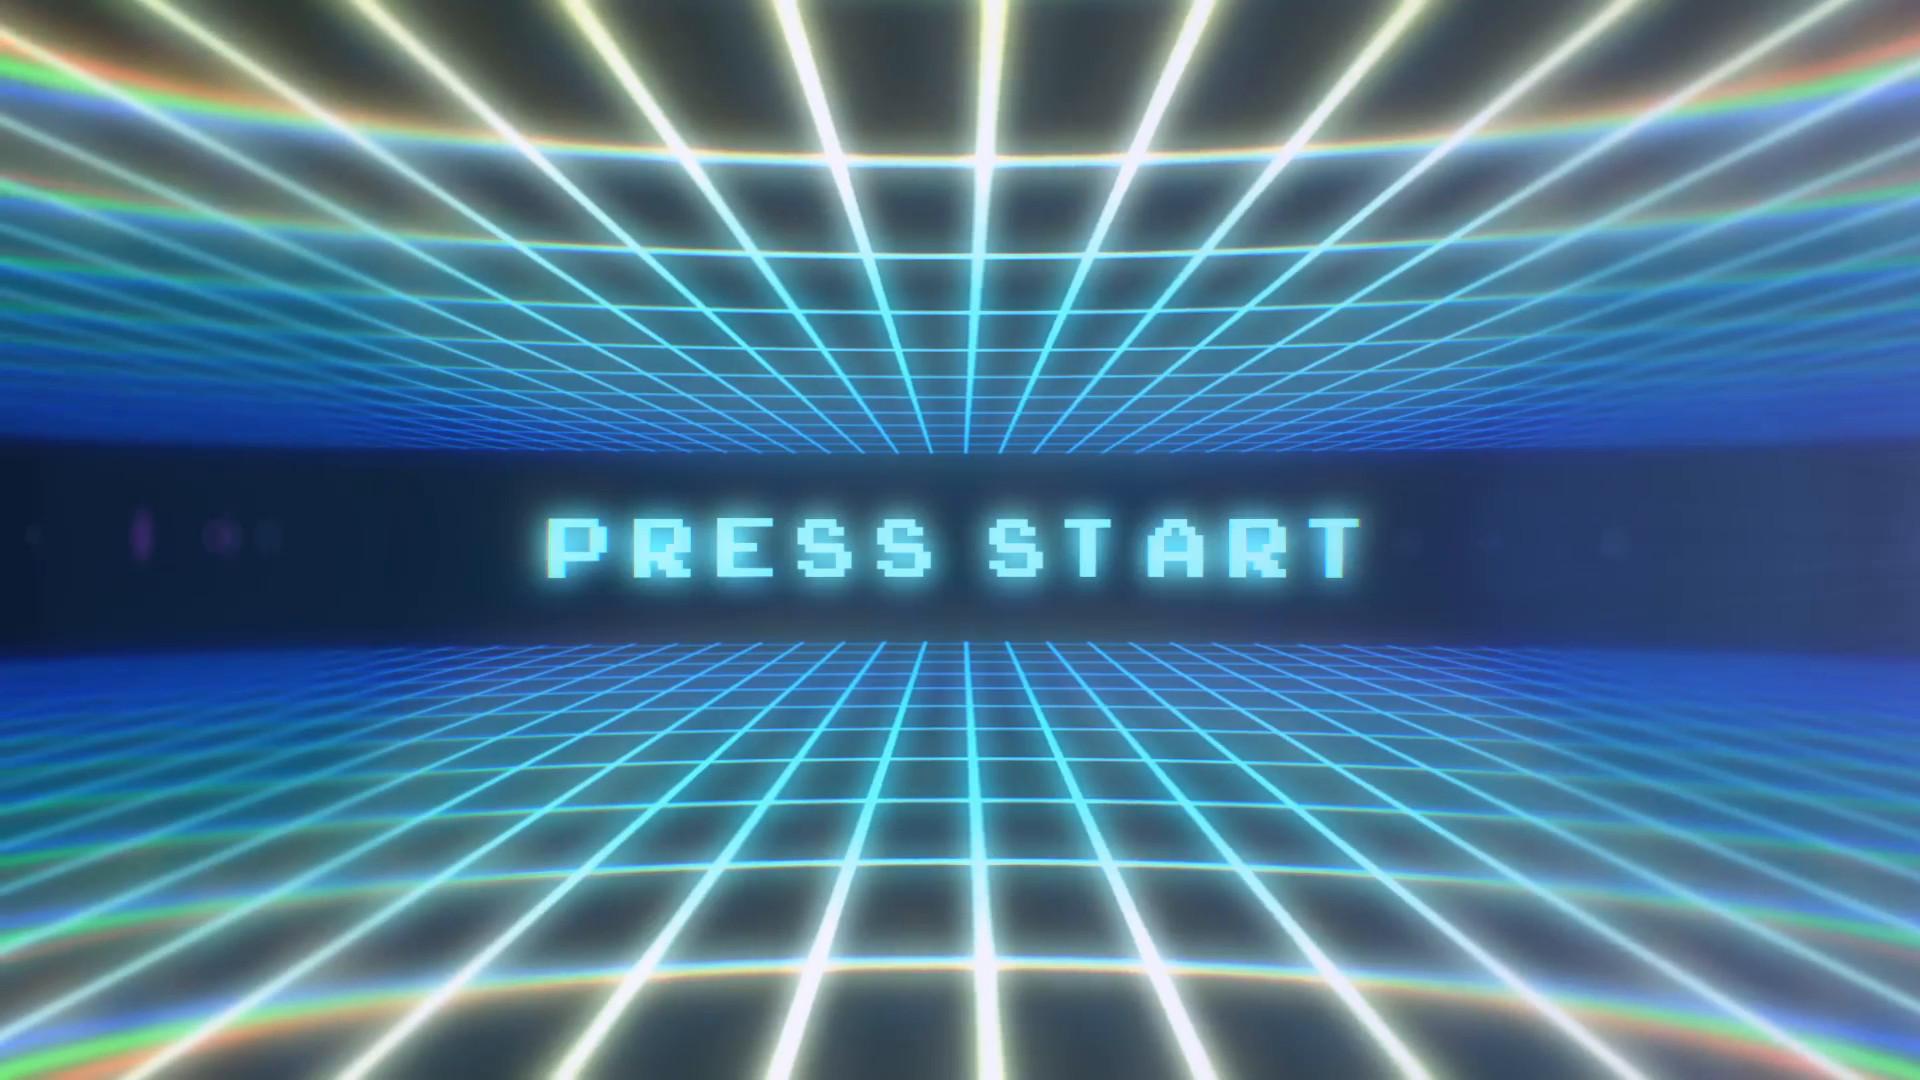 Res: 1920x1080, Video Game Press Start Retro Arcade Screen Motion Background - Videoblocks